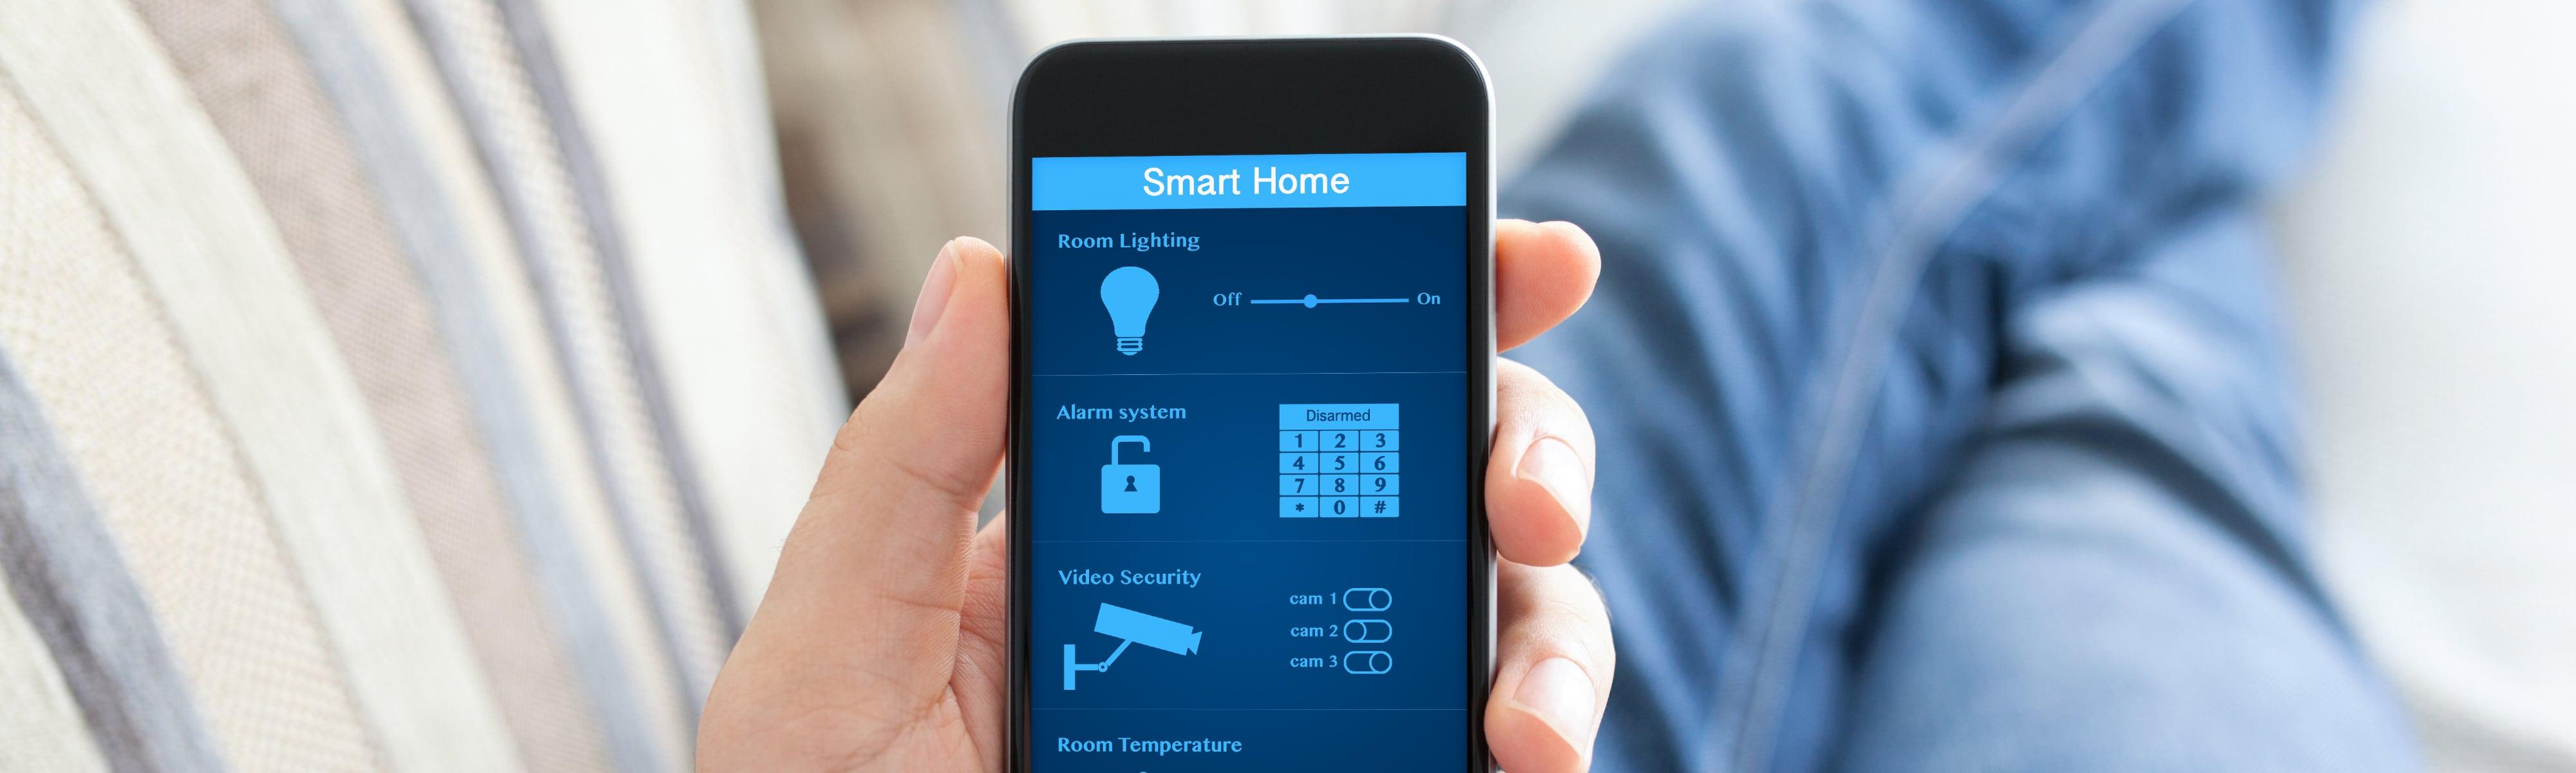 Smart home automation on a smartphone.